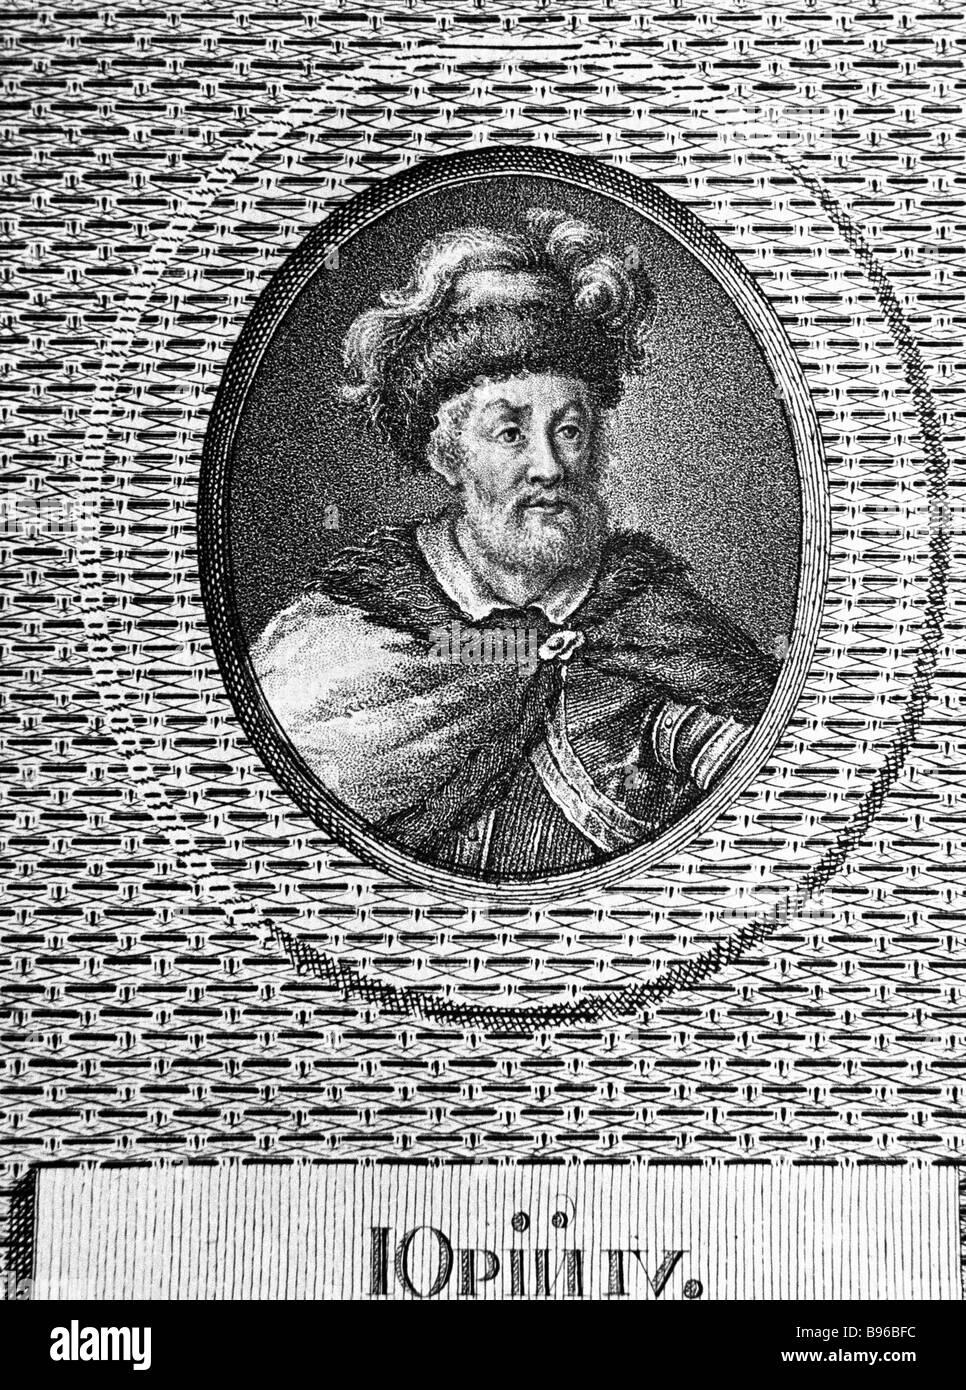 Yury Dmitriyevich the son of Dmitry Donskoi and Prince of Zvenigorod and Galich Kostromskoi since 1389 was the Grand - Stock Image